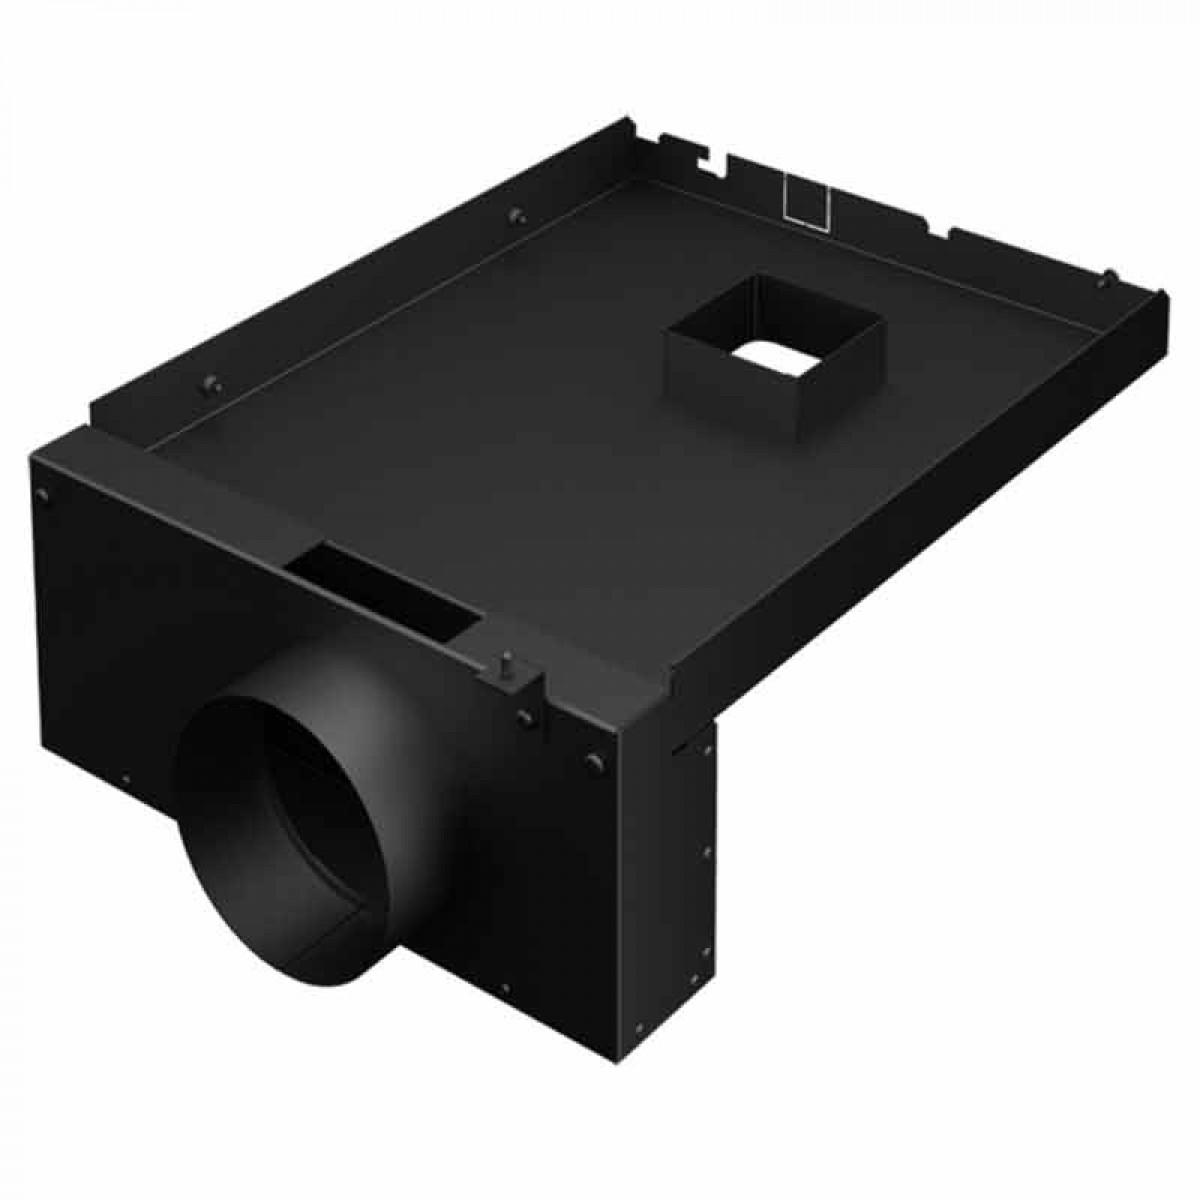 Osburn Ac01338 5 In Fresh Air Intake Kit For Wood Stove On